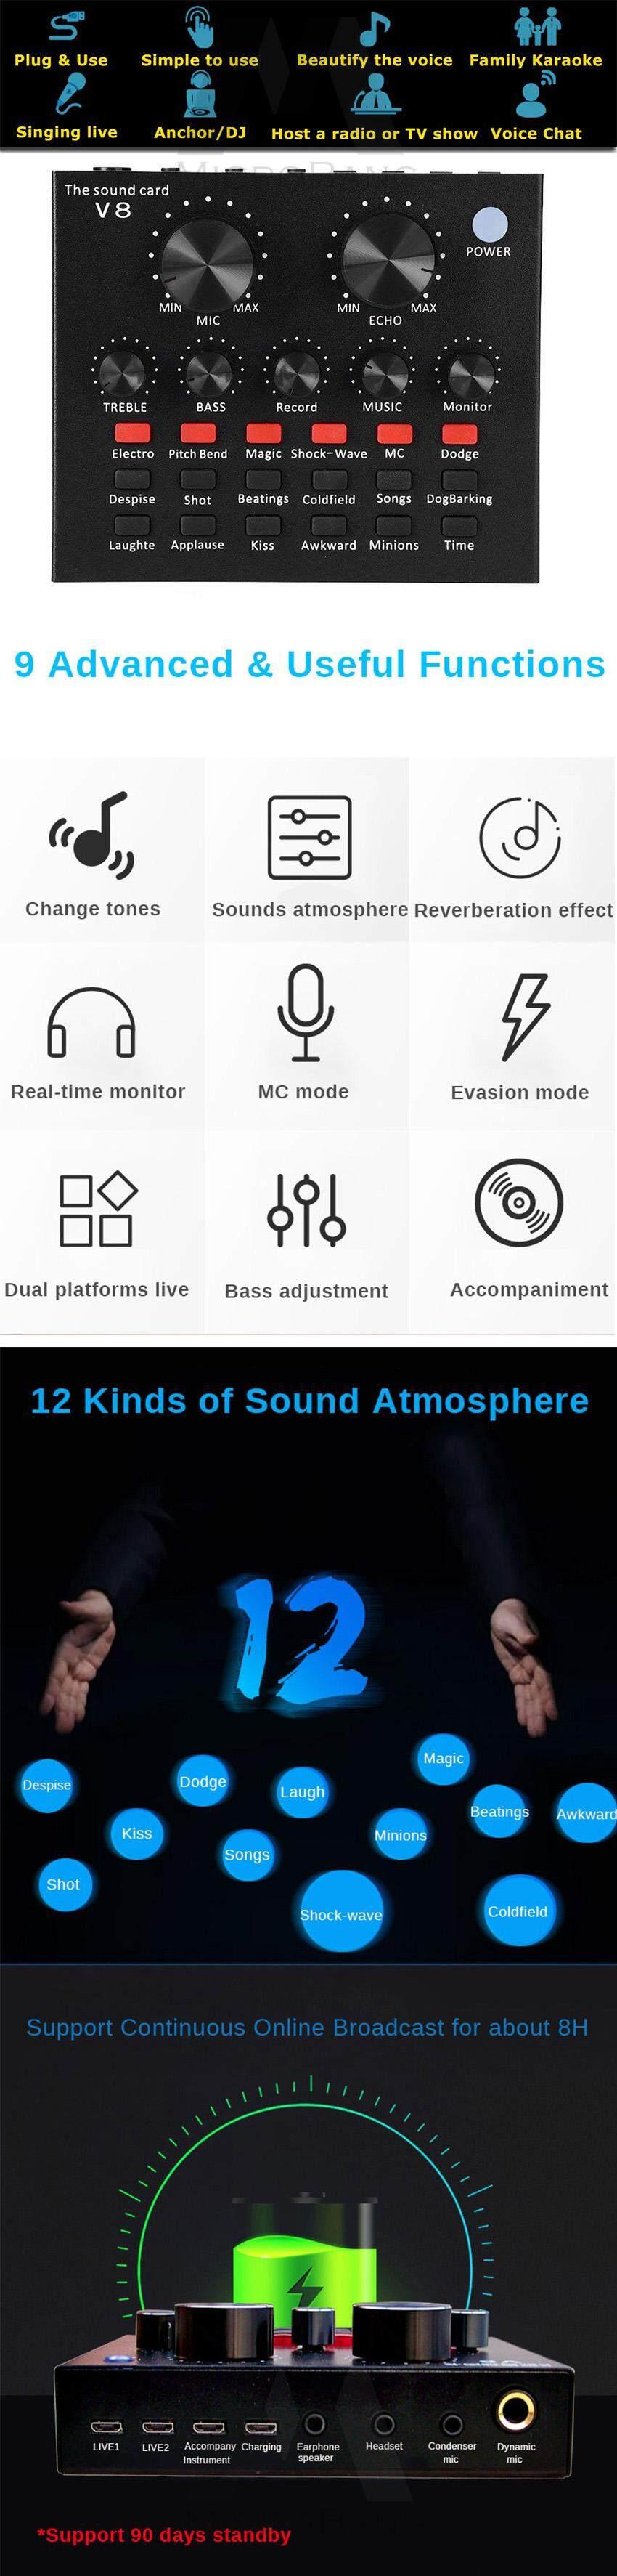 MicroBang Audio Mixer Karaoke Sound Mixer Compact Mixer Live Streaming  Audio Interface with 12 Electric Sounds 12 Sound Effects 3 Tones